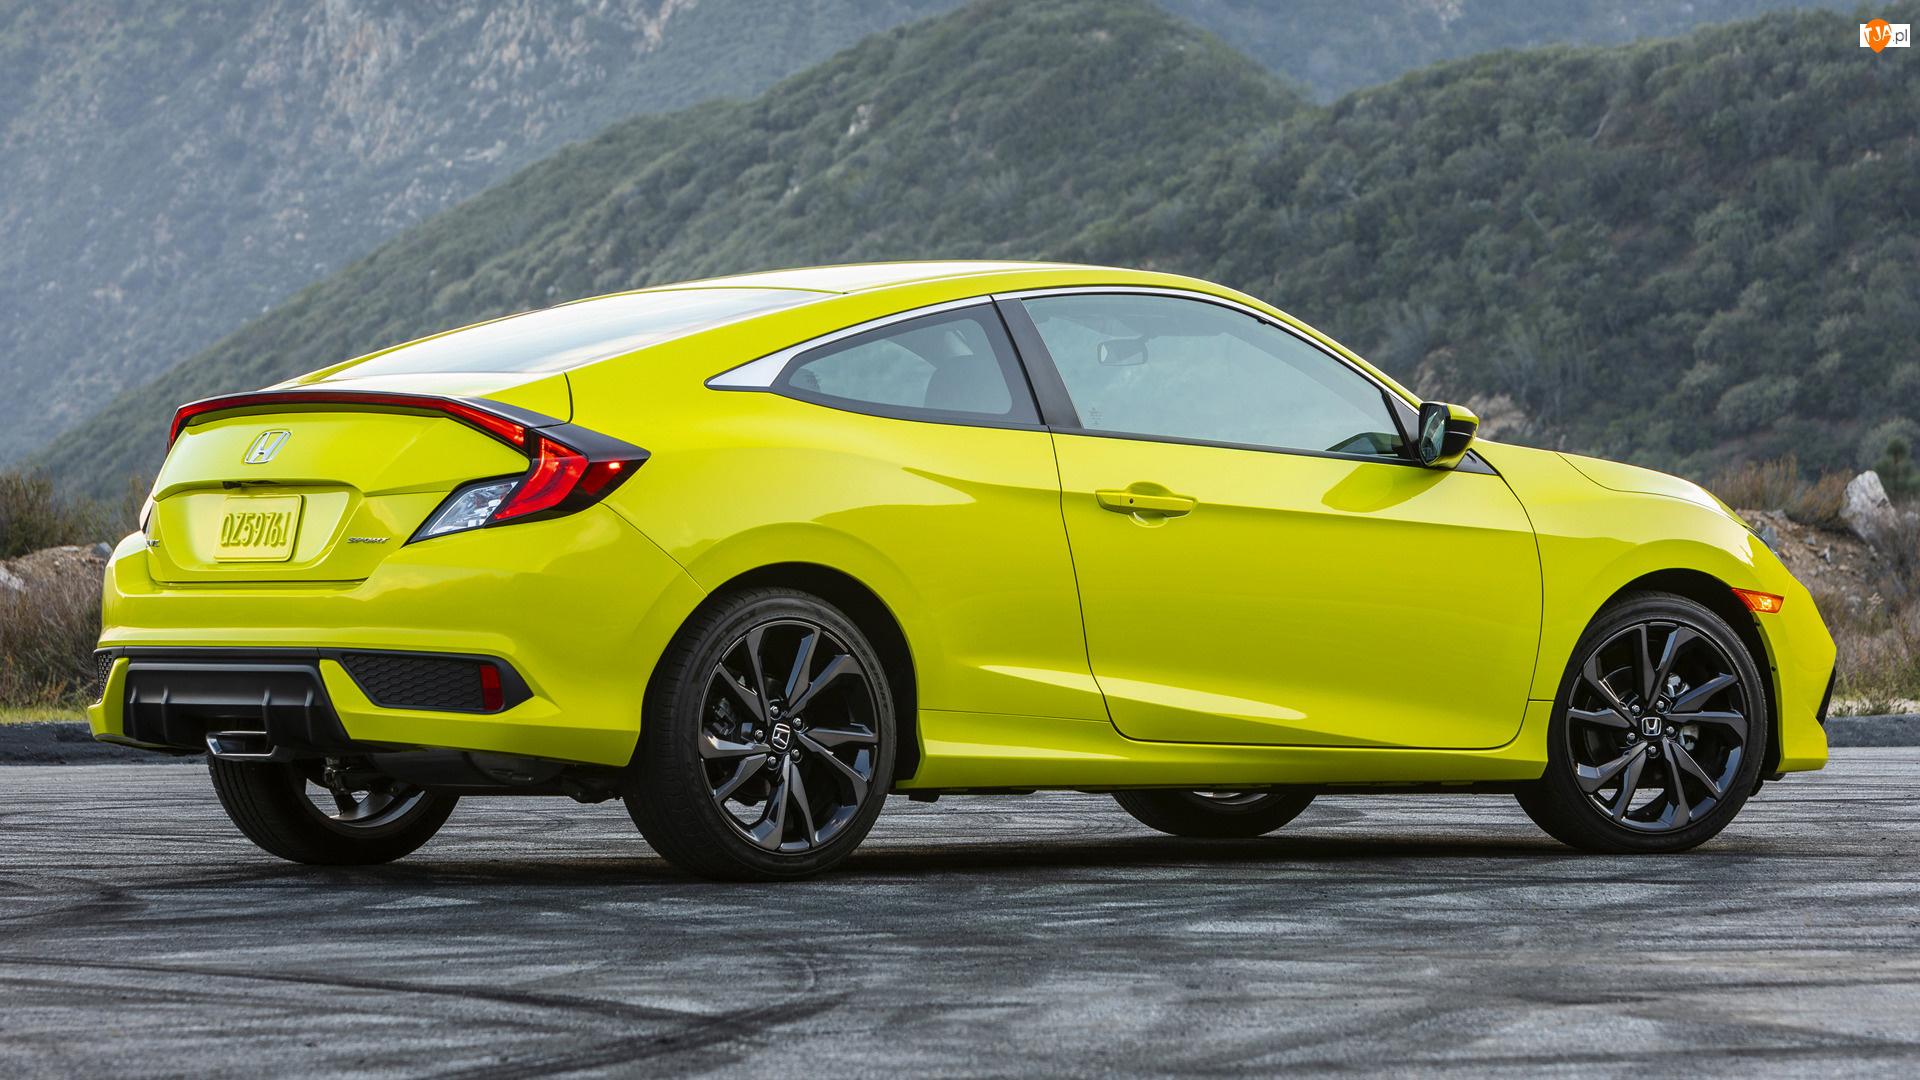 Coupe, Żółta, Honda Civic